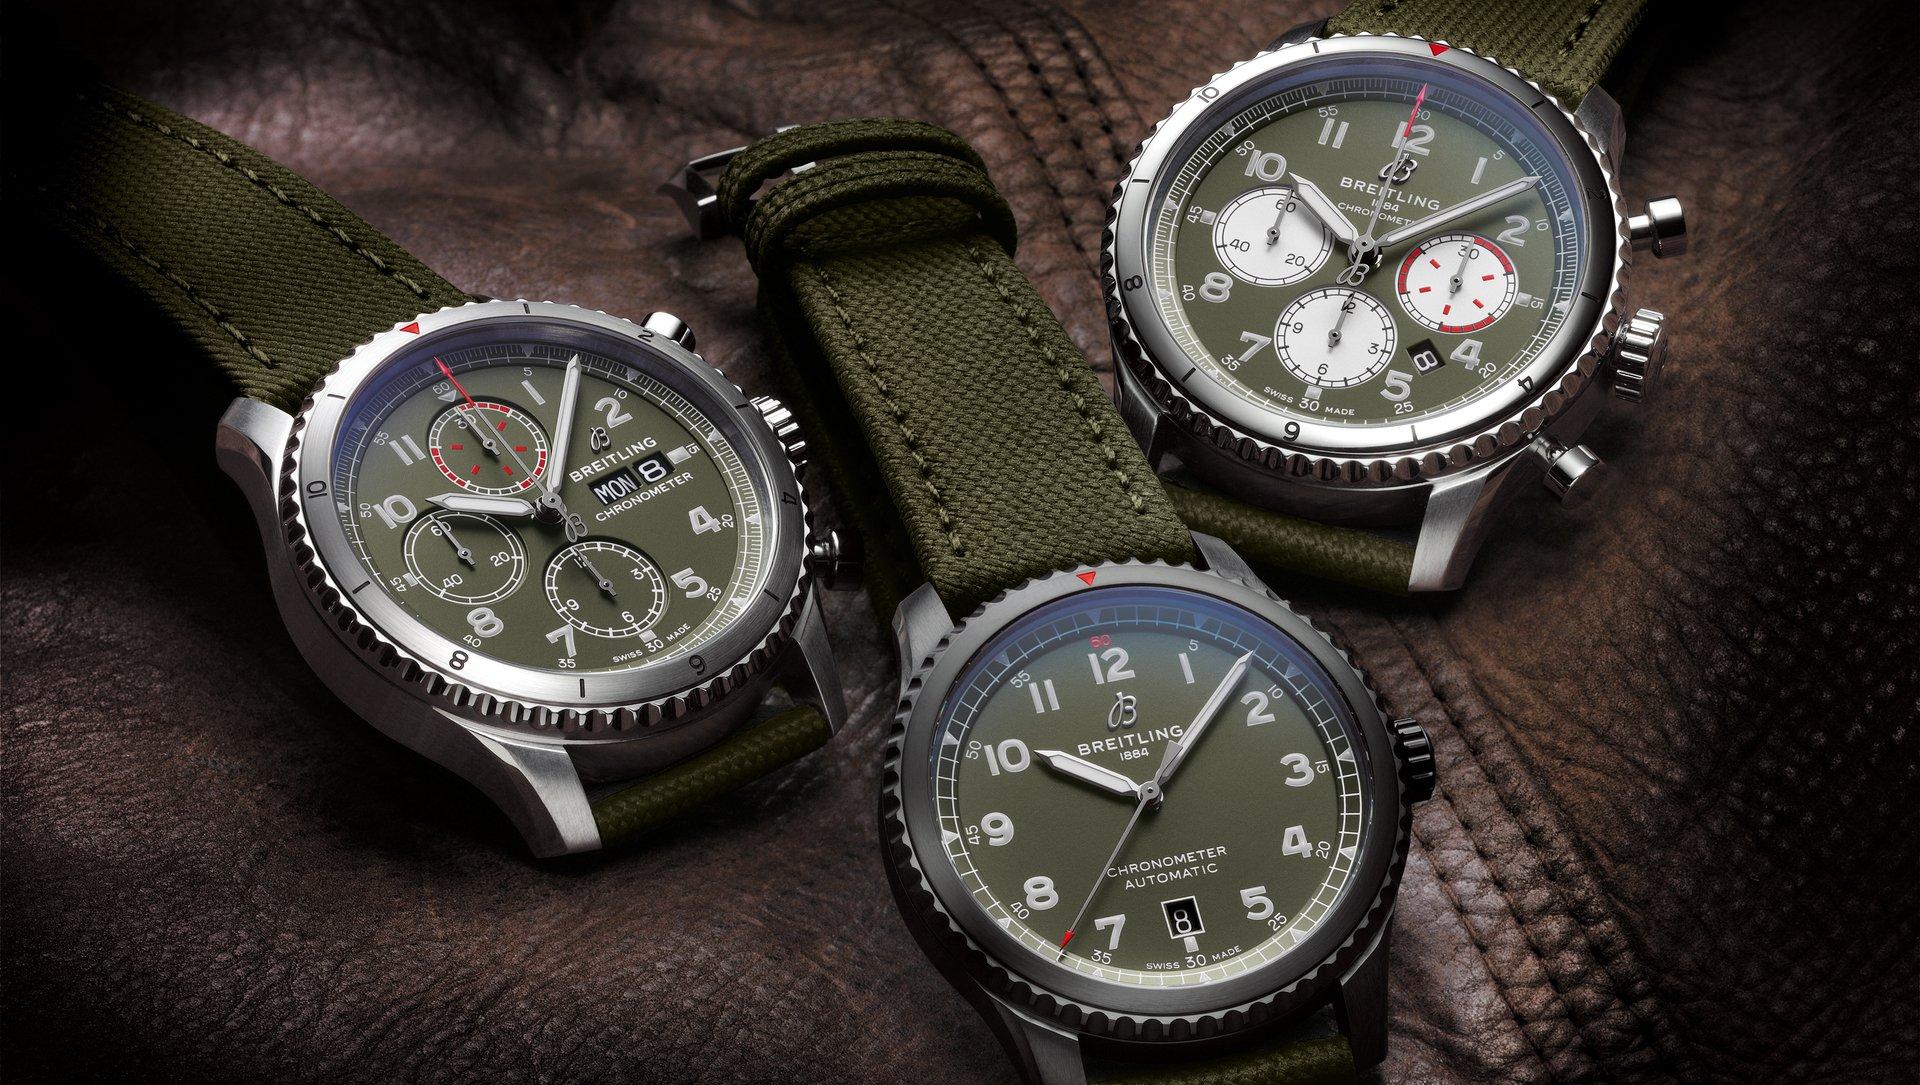 Naziv: 01_aviator-8-curtiss-warhawk-editions_20847_15-02-19.jpg, pregleda: 182, veličina: 453,0 KB